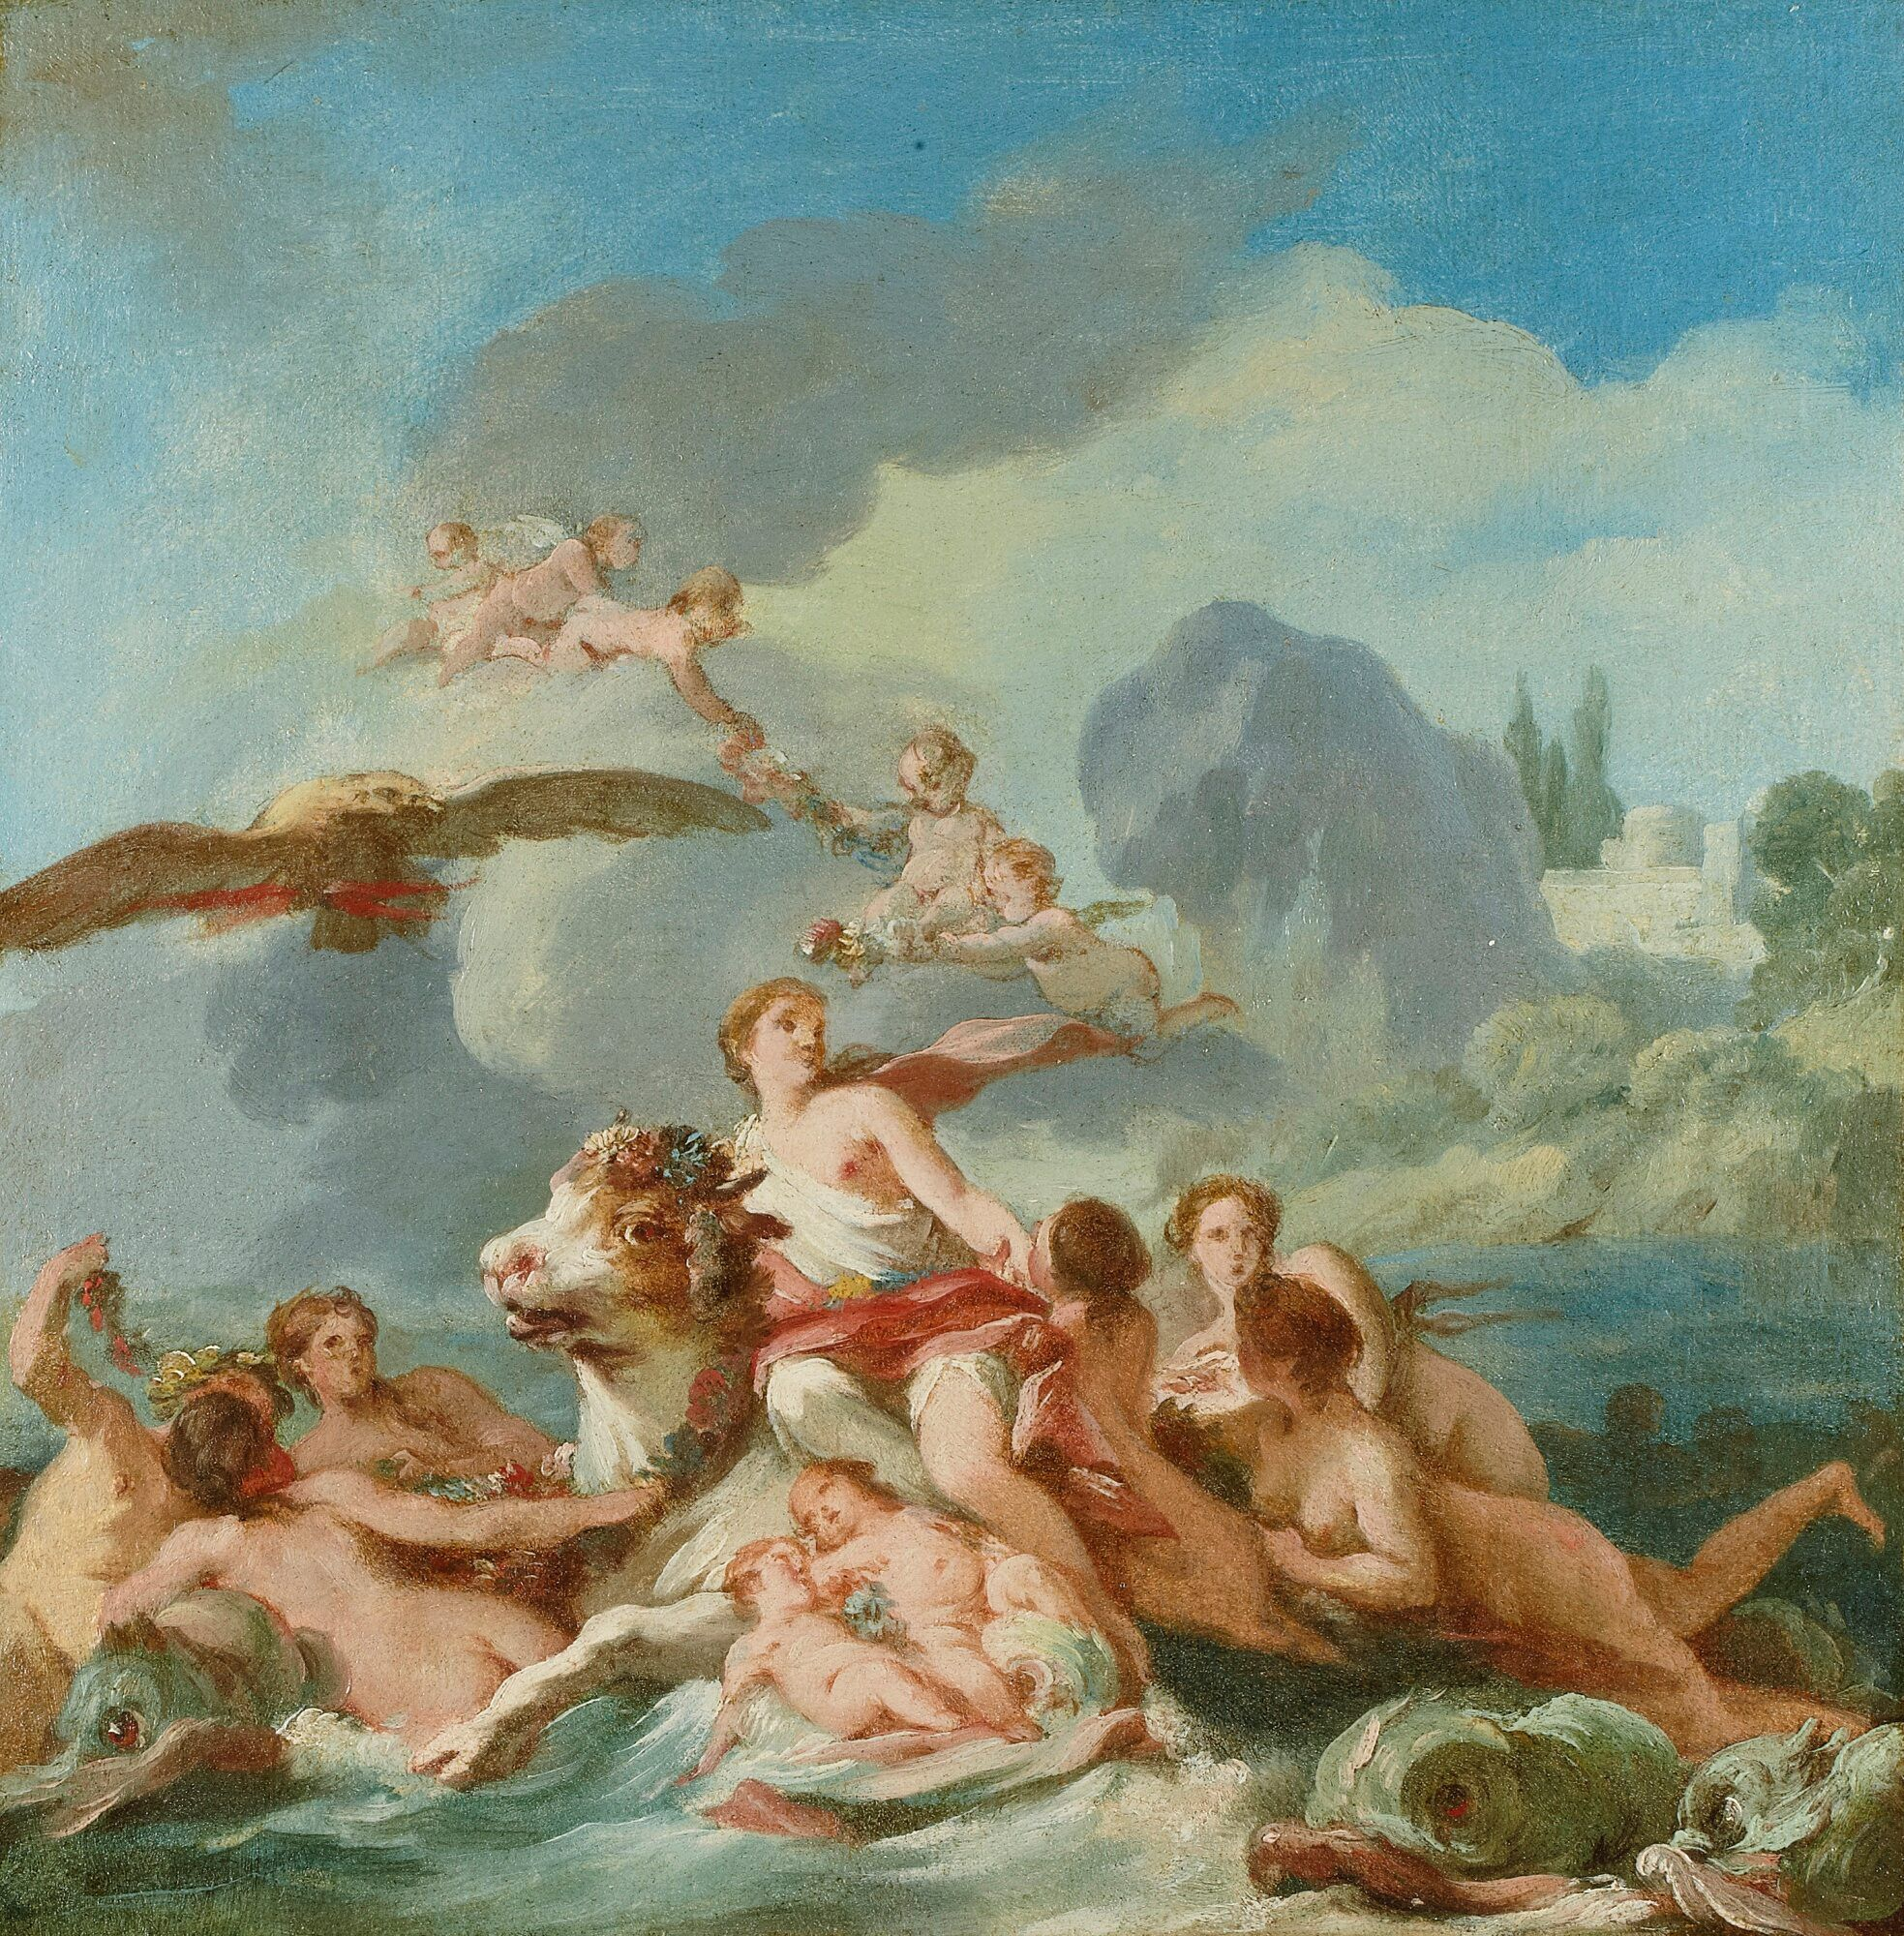 Pierre Jean Baptiste Marie Th Mythology Sotheby S N09161lot7gp3hen Renaissance Art Paintings Rococo Art Mythology Art